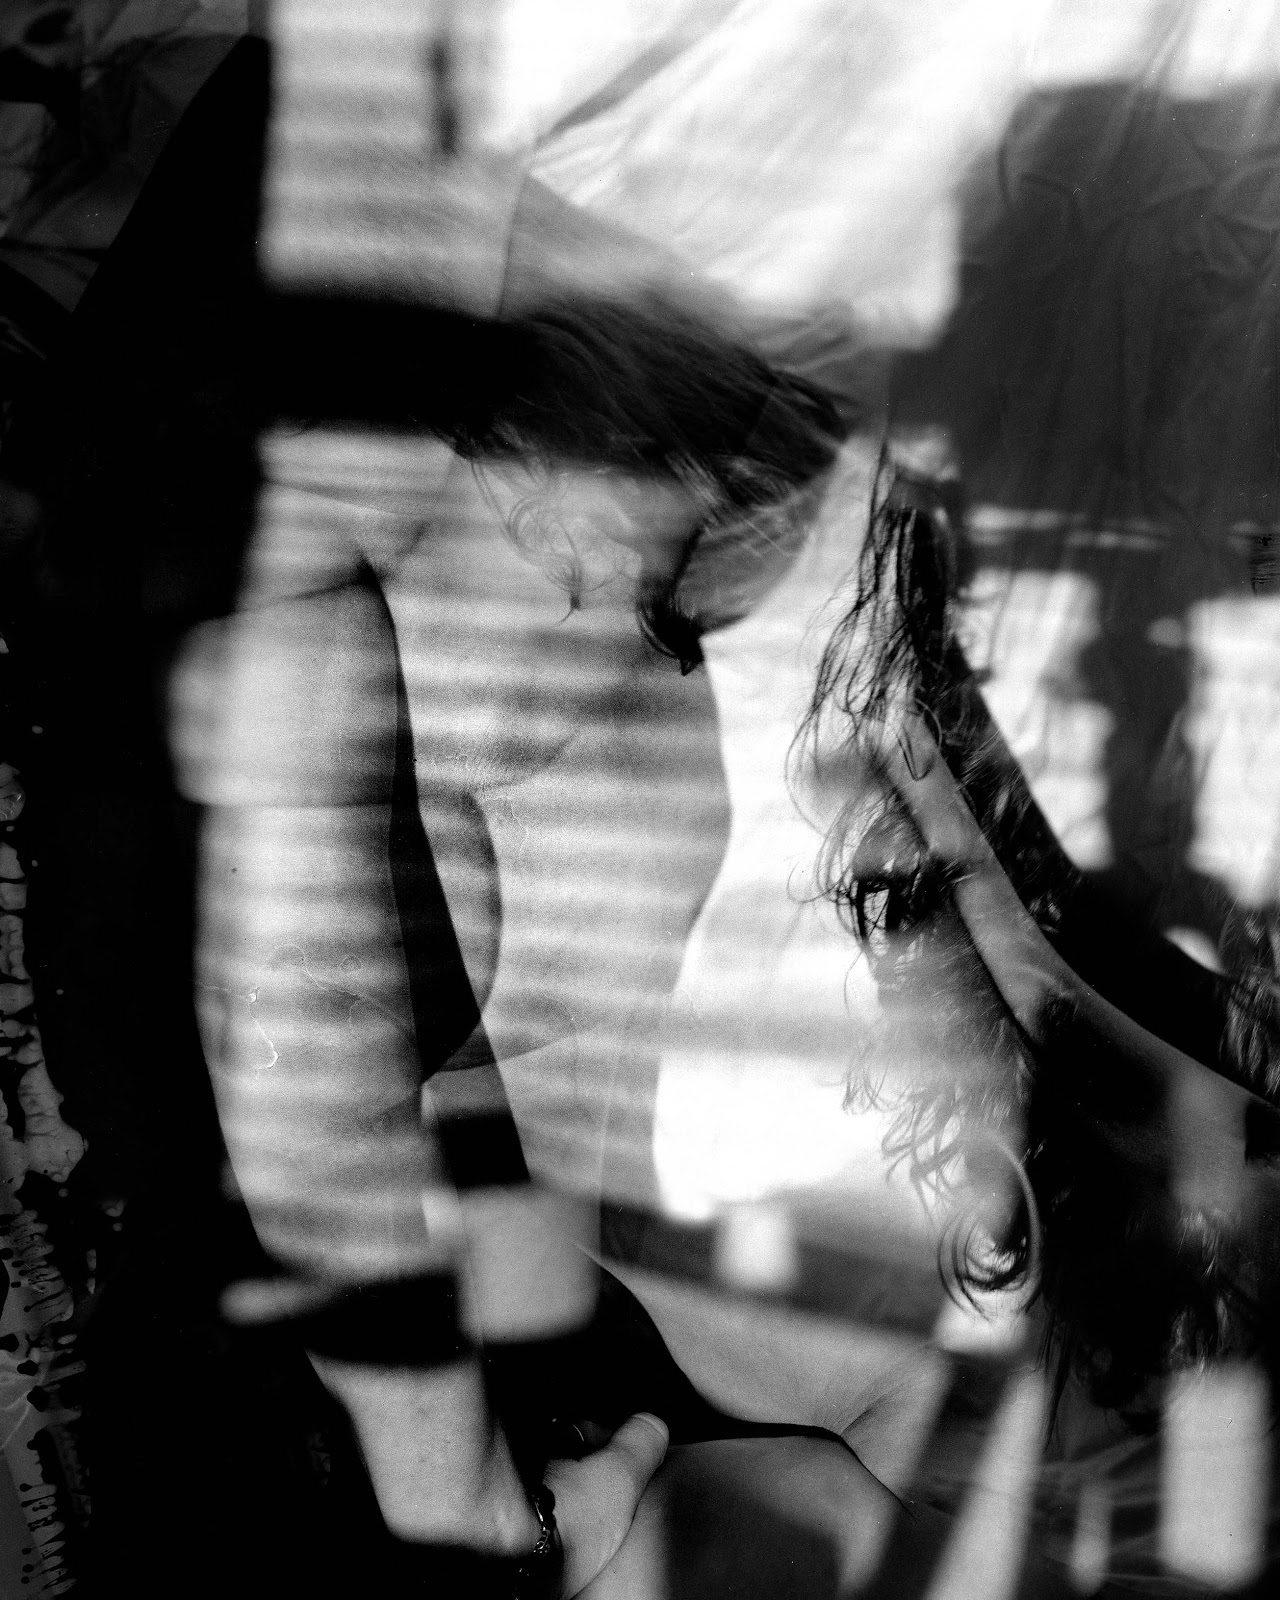 Untitled abstract photo by Katrina Winberg